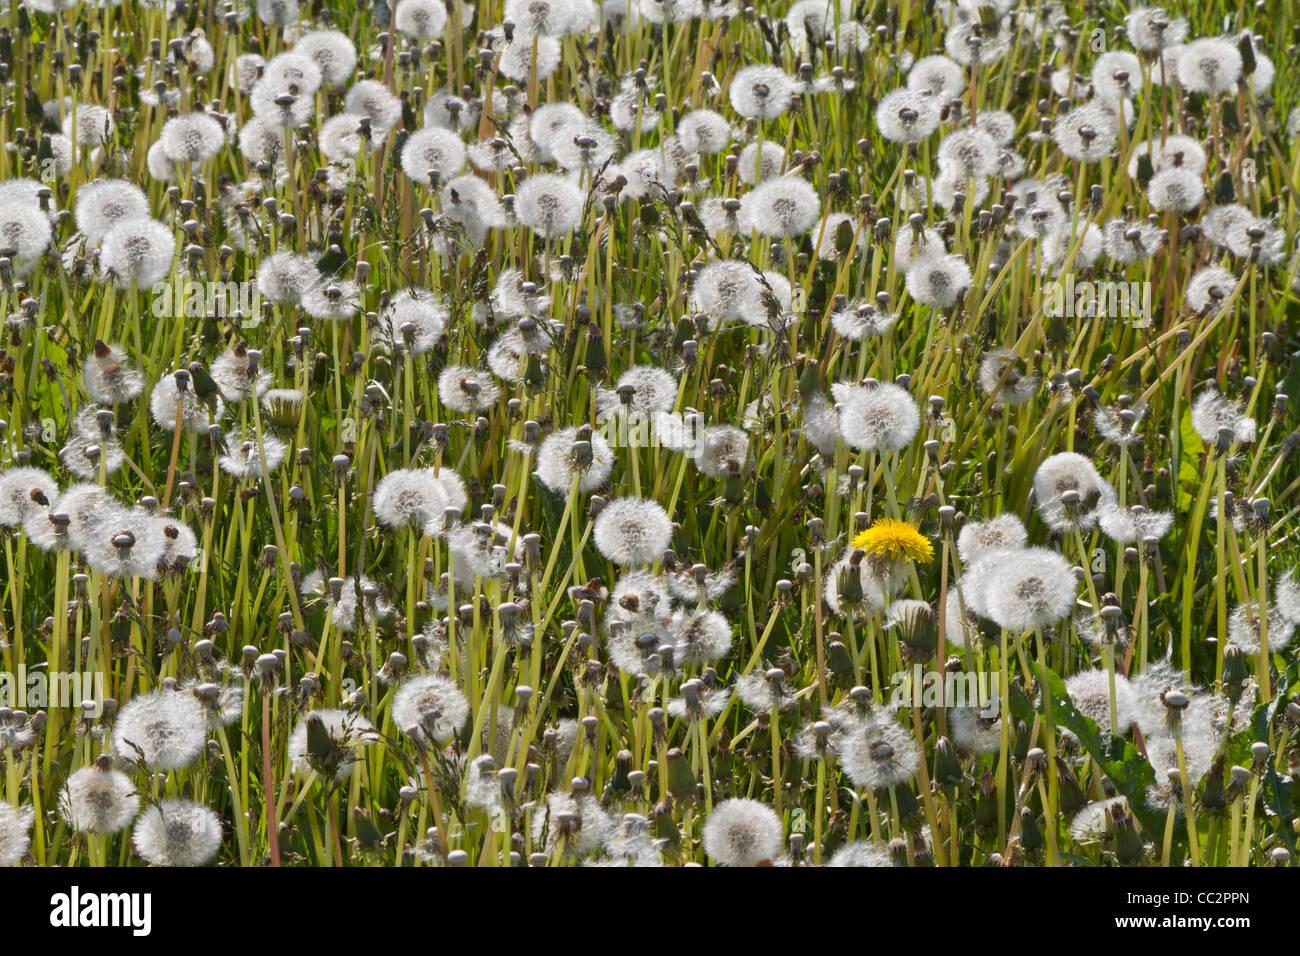 Blowball field - Stock Image